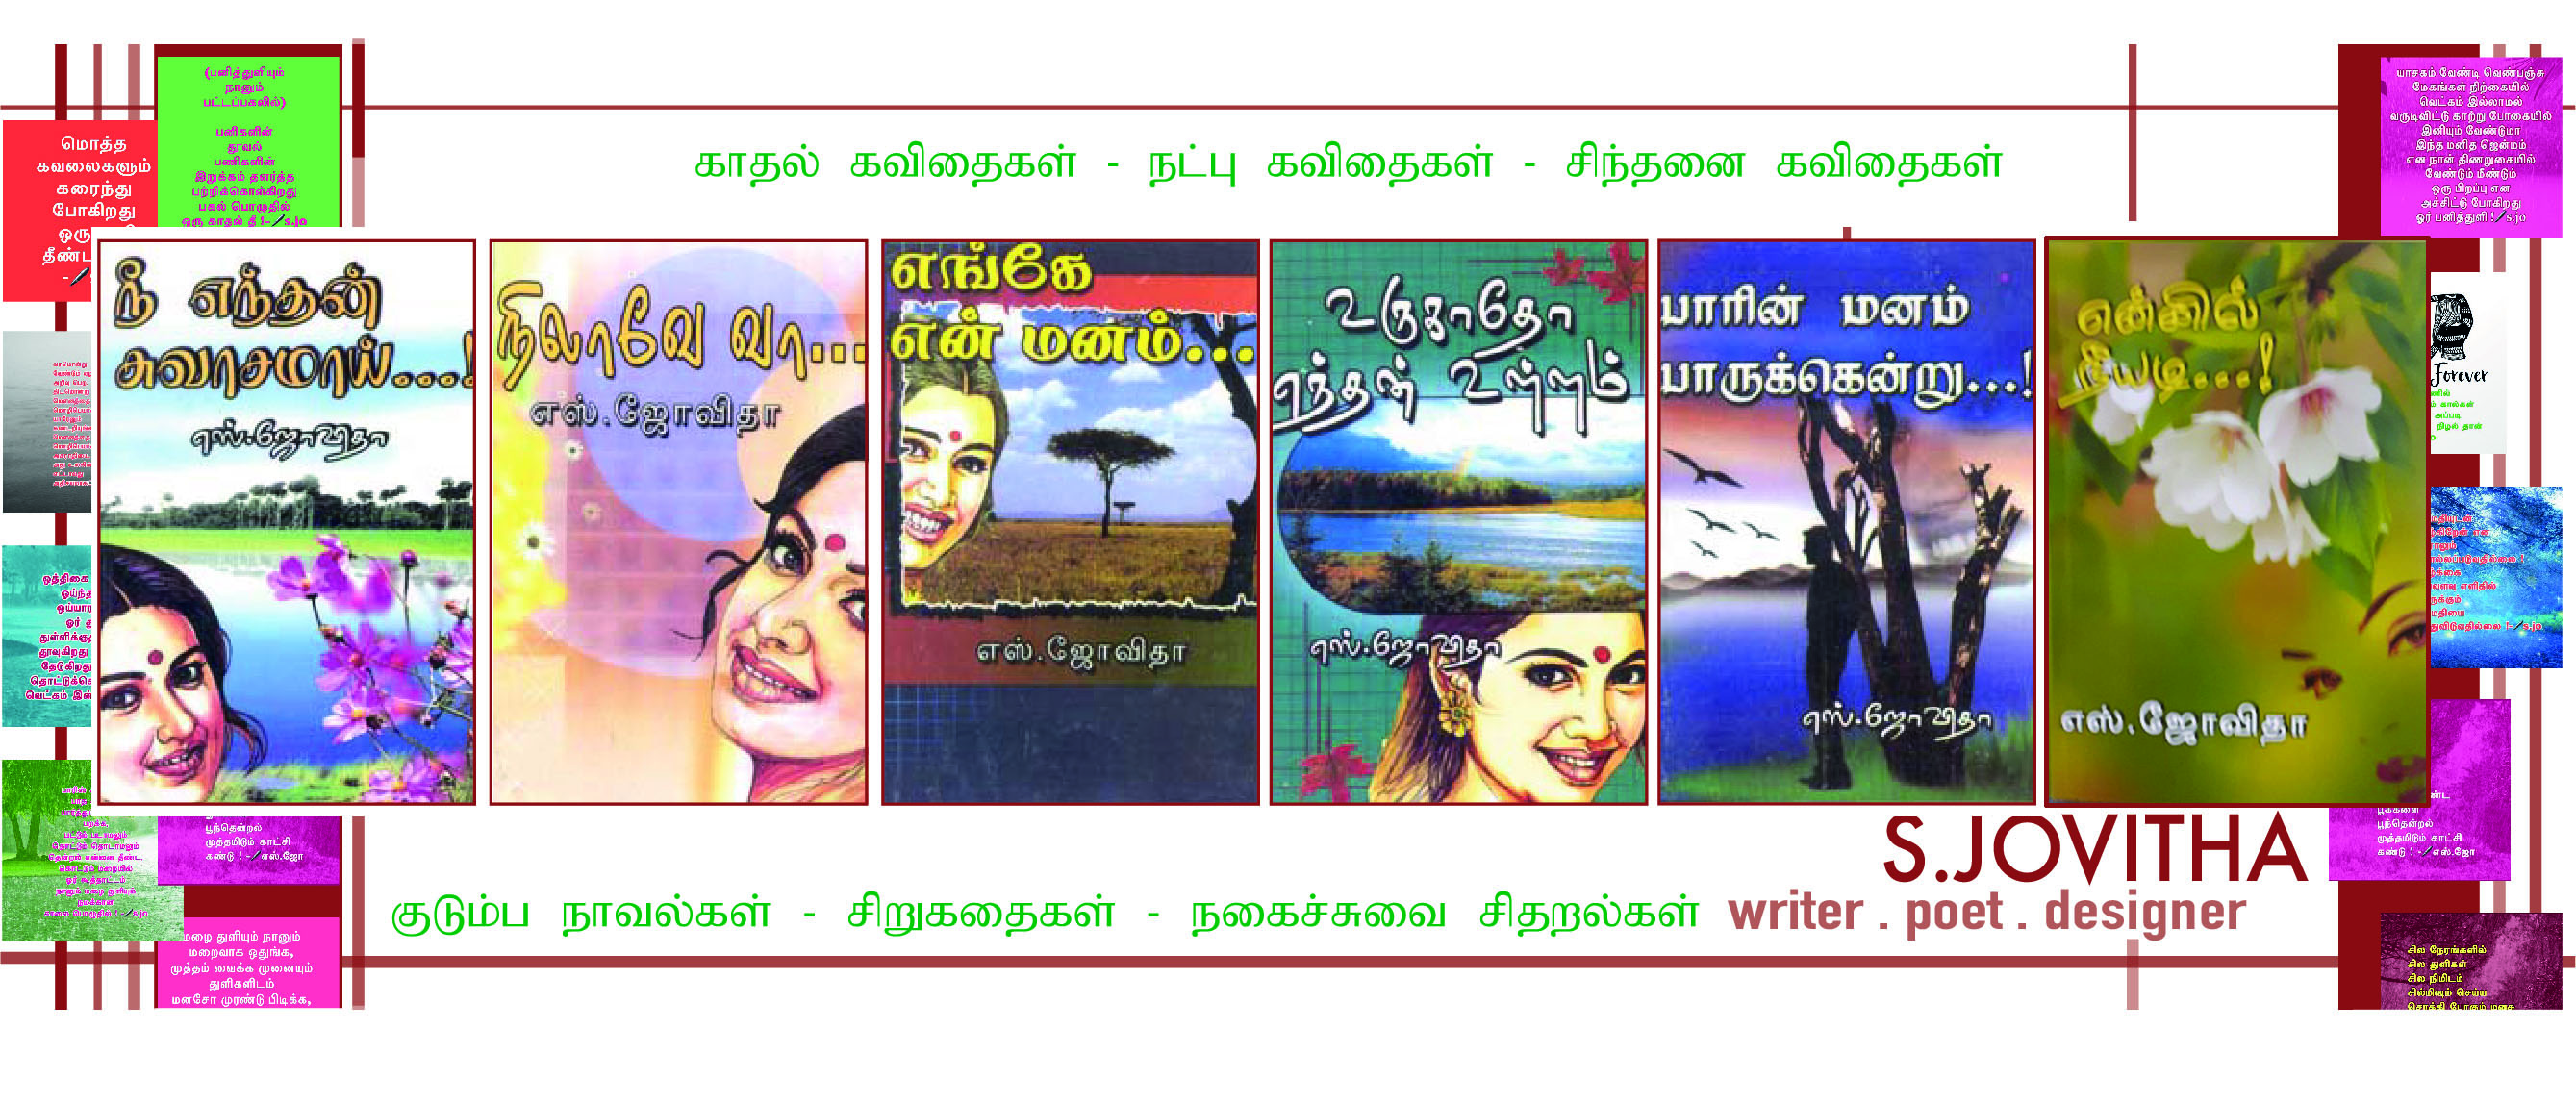 S.Jovitha's Tamil Romantic Novels